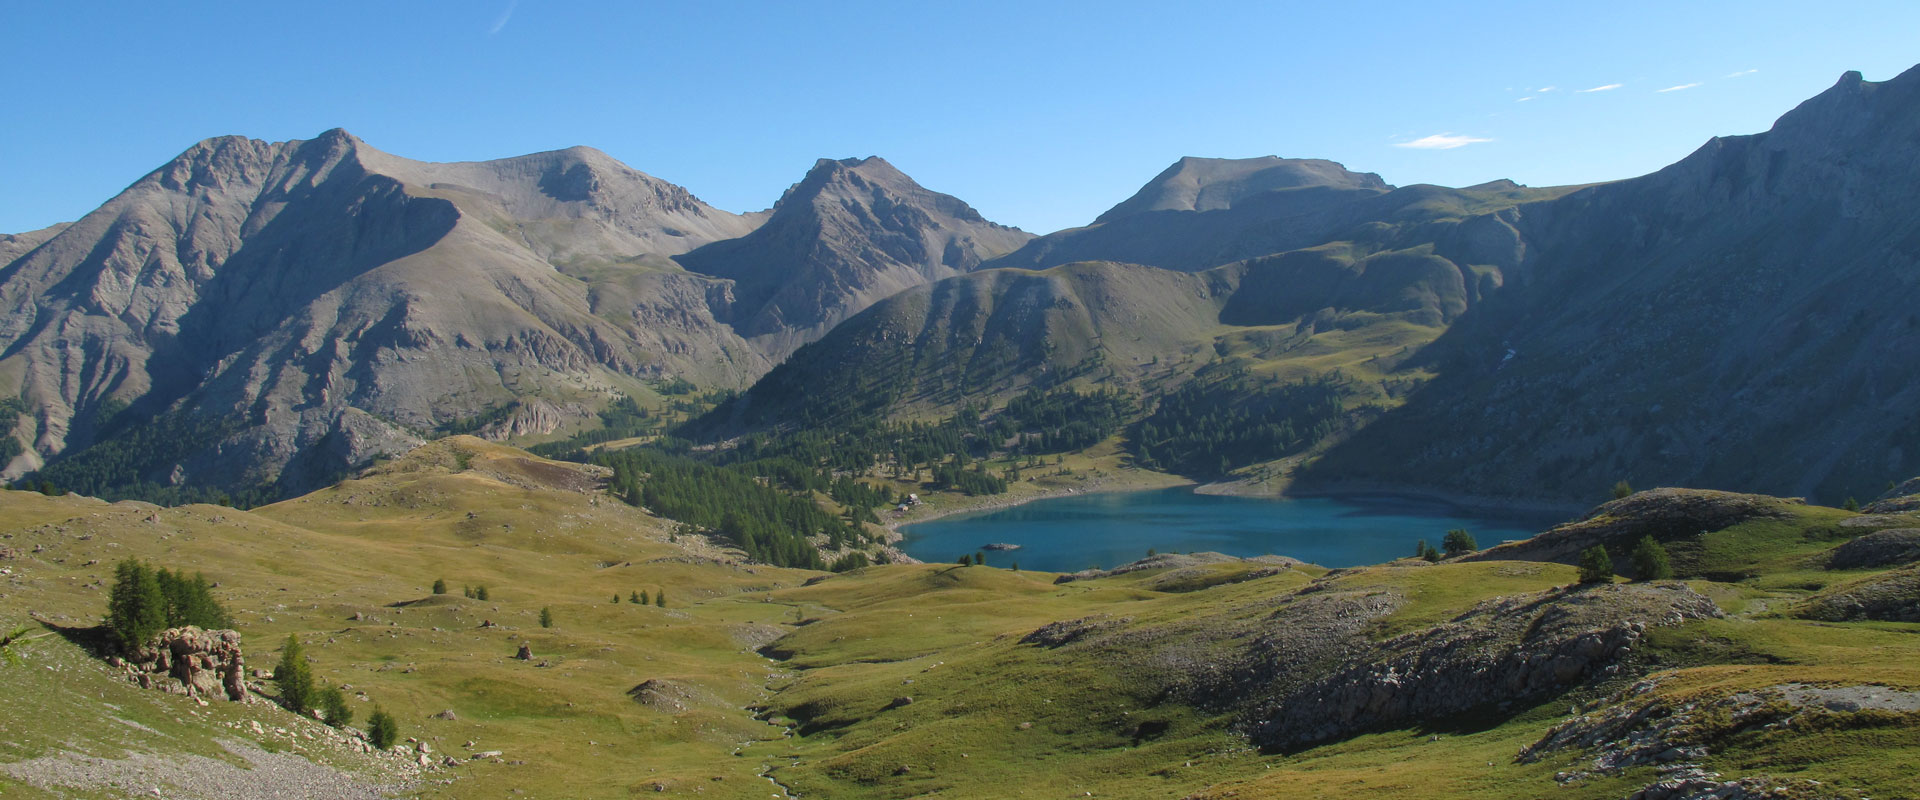 Alps: Mercantour National Park